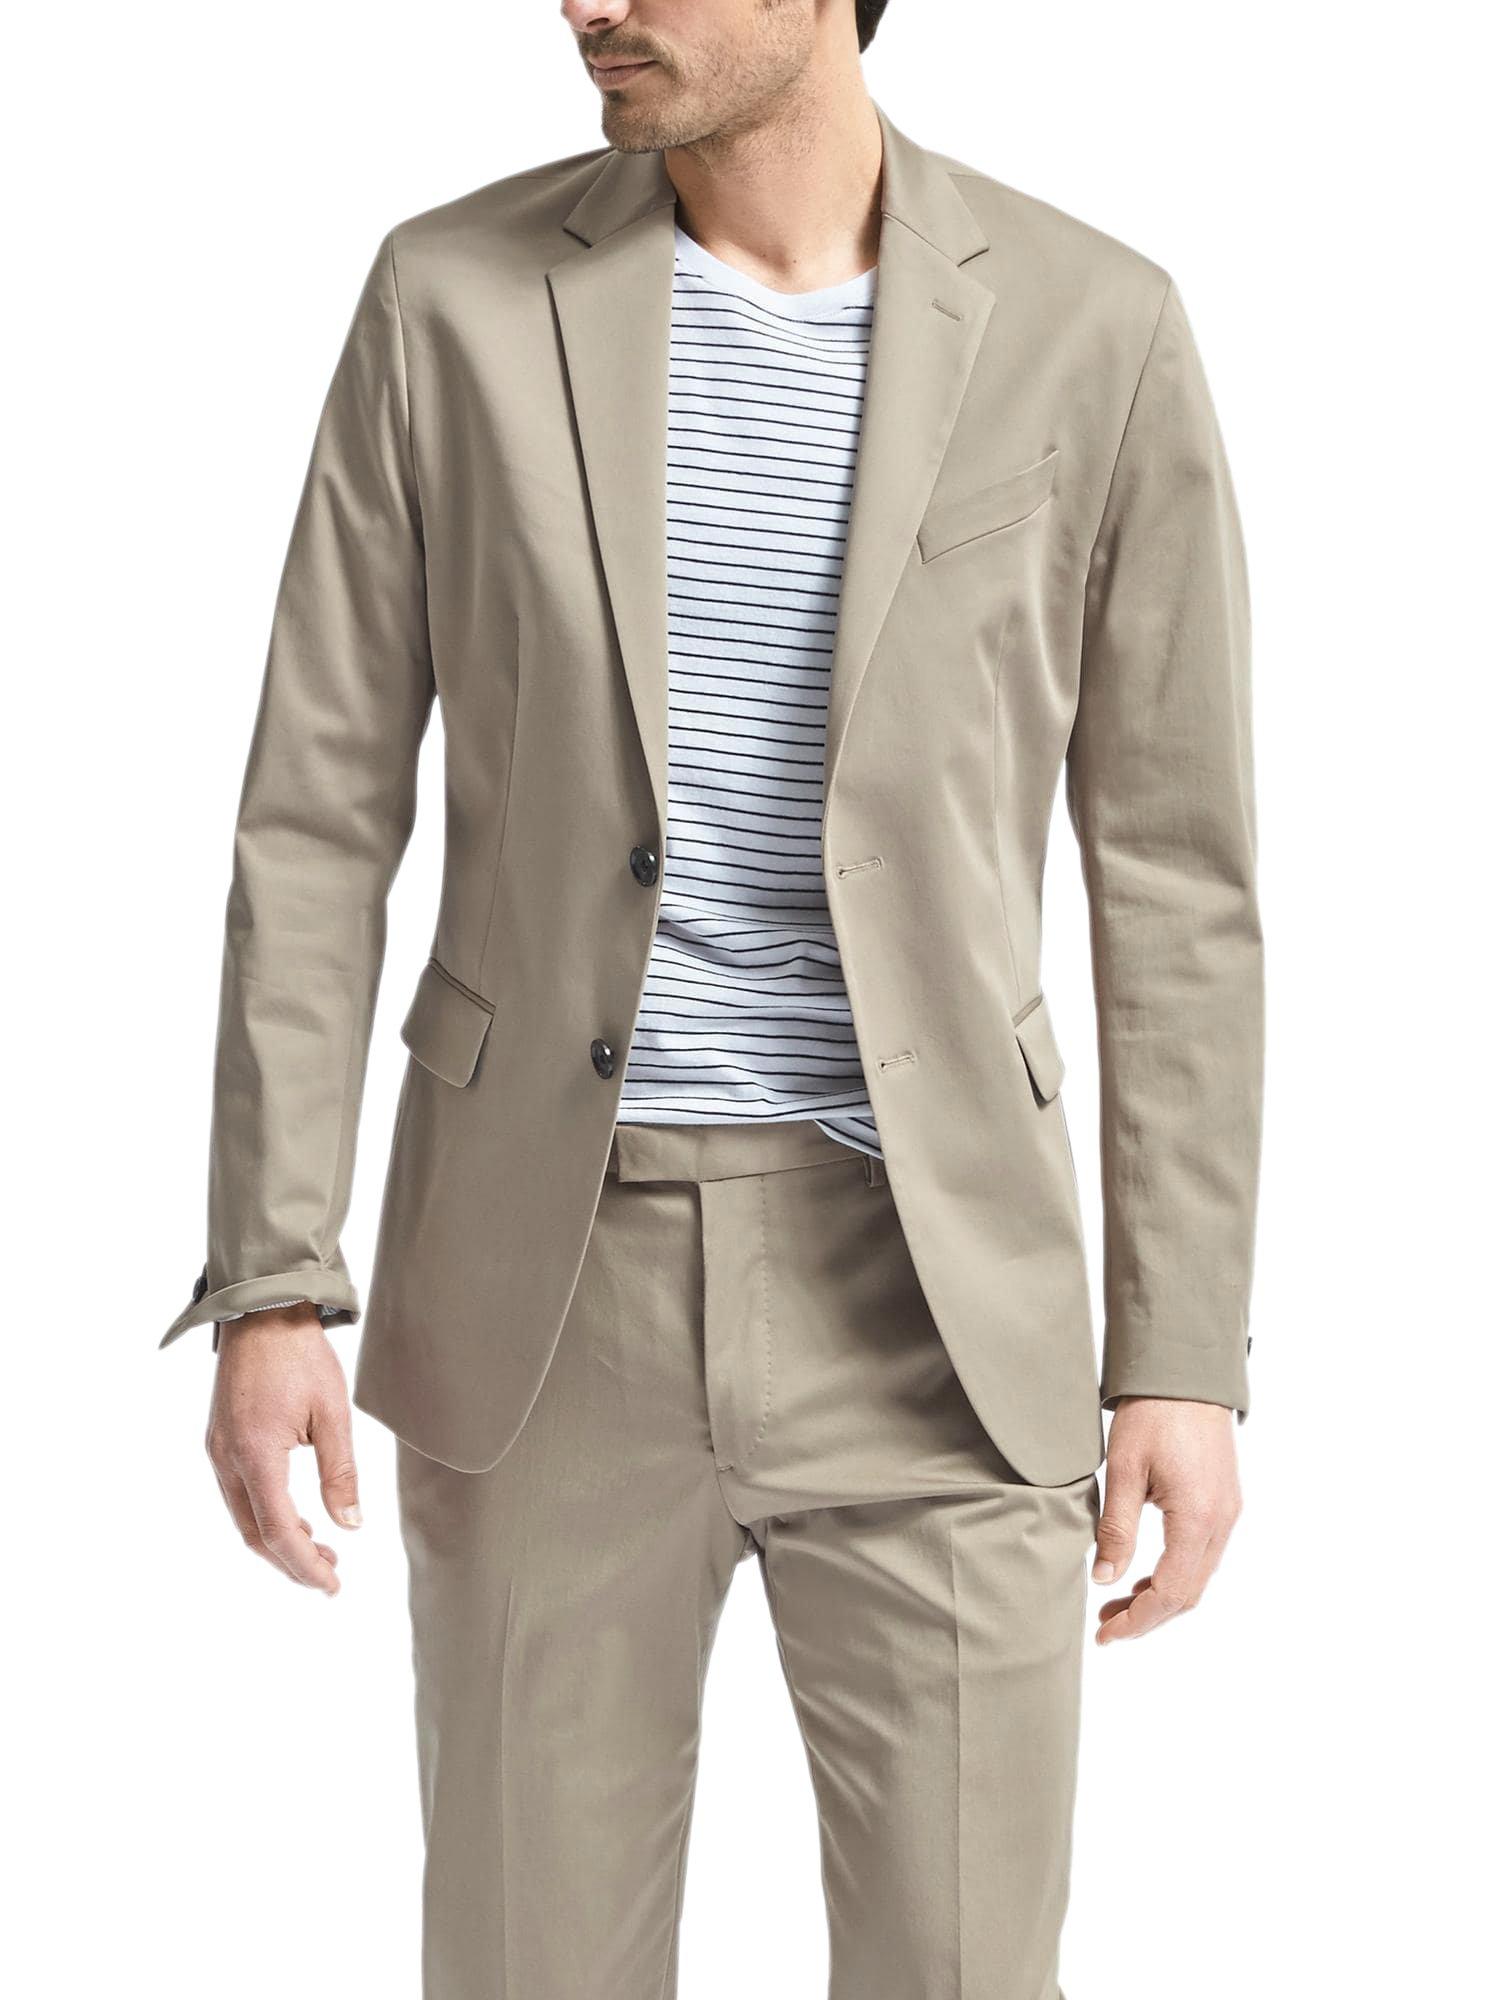 Banana Republic Men's Slim Fit Stretch Cotton Two Button Blazer Jacker Acorn 42R Regular